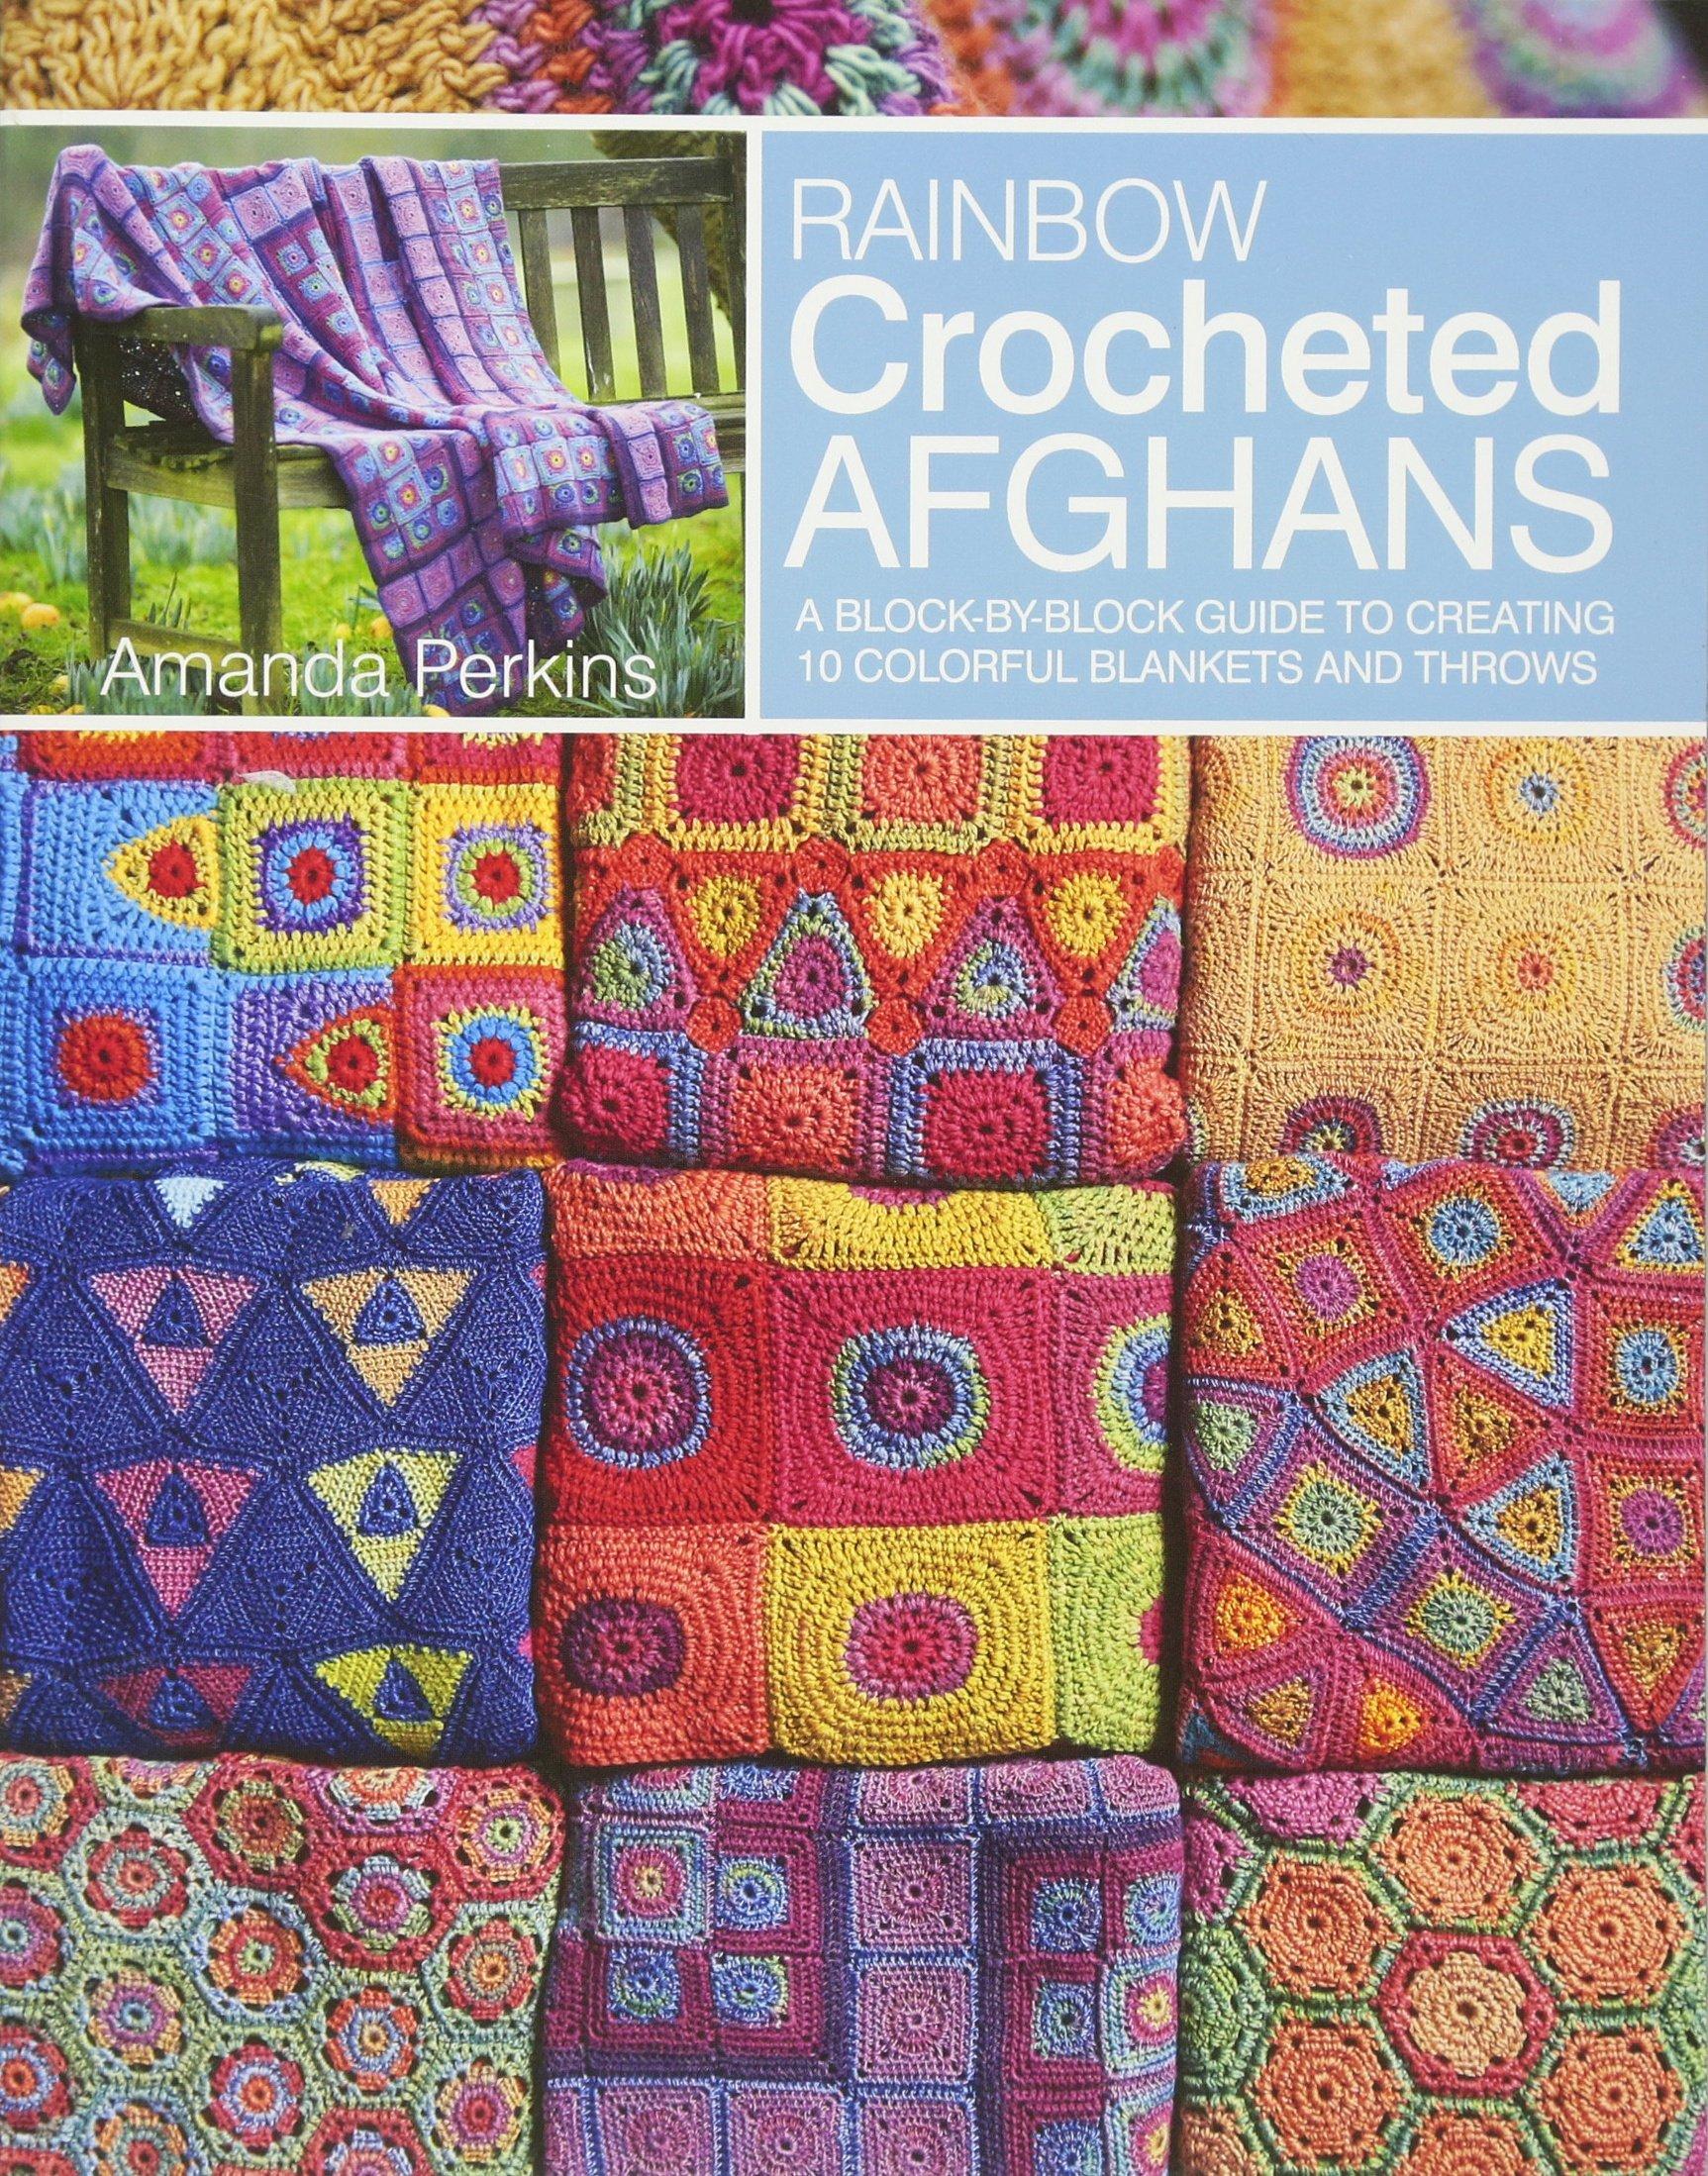 rainbow crocheted afghans a blockbyblock guide to creating  - rainbow crocheted afghans a blockbyblock guide to creating colorfulblankets and throws amanda perkins  amazoncom books